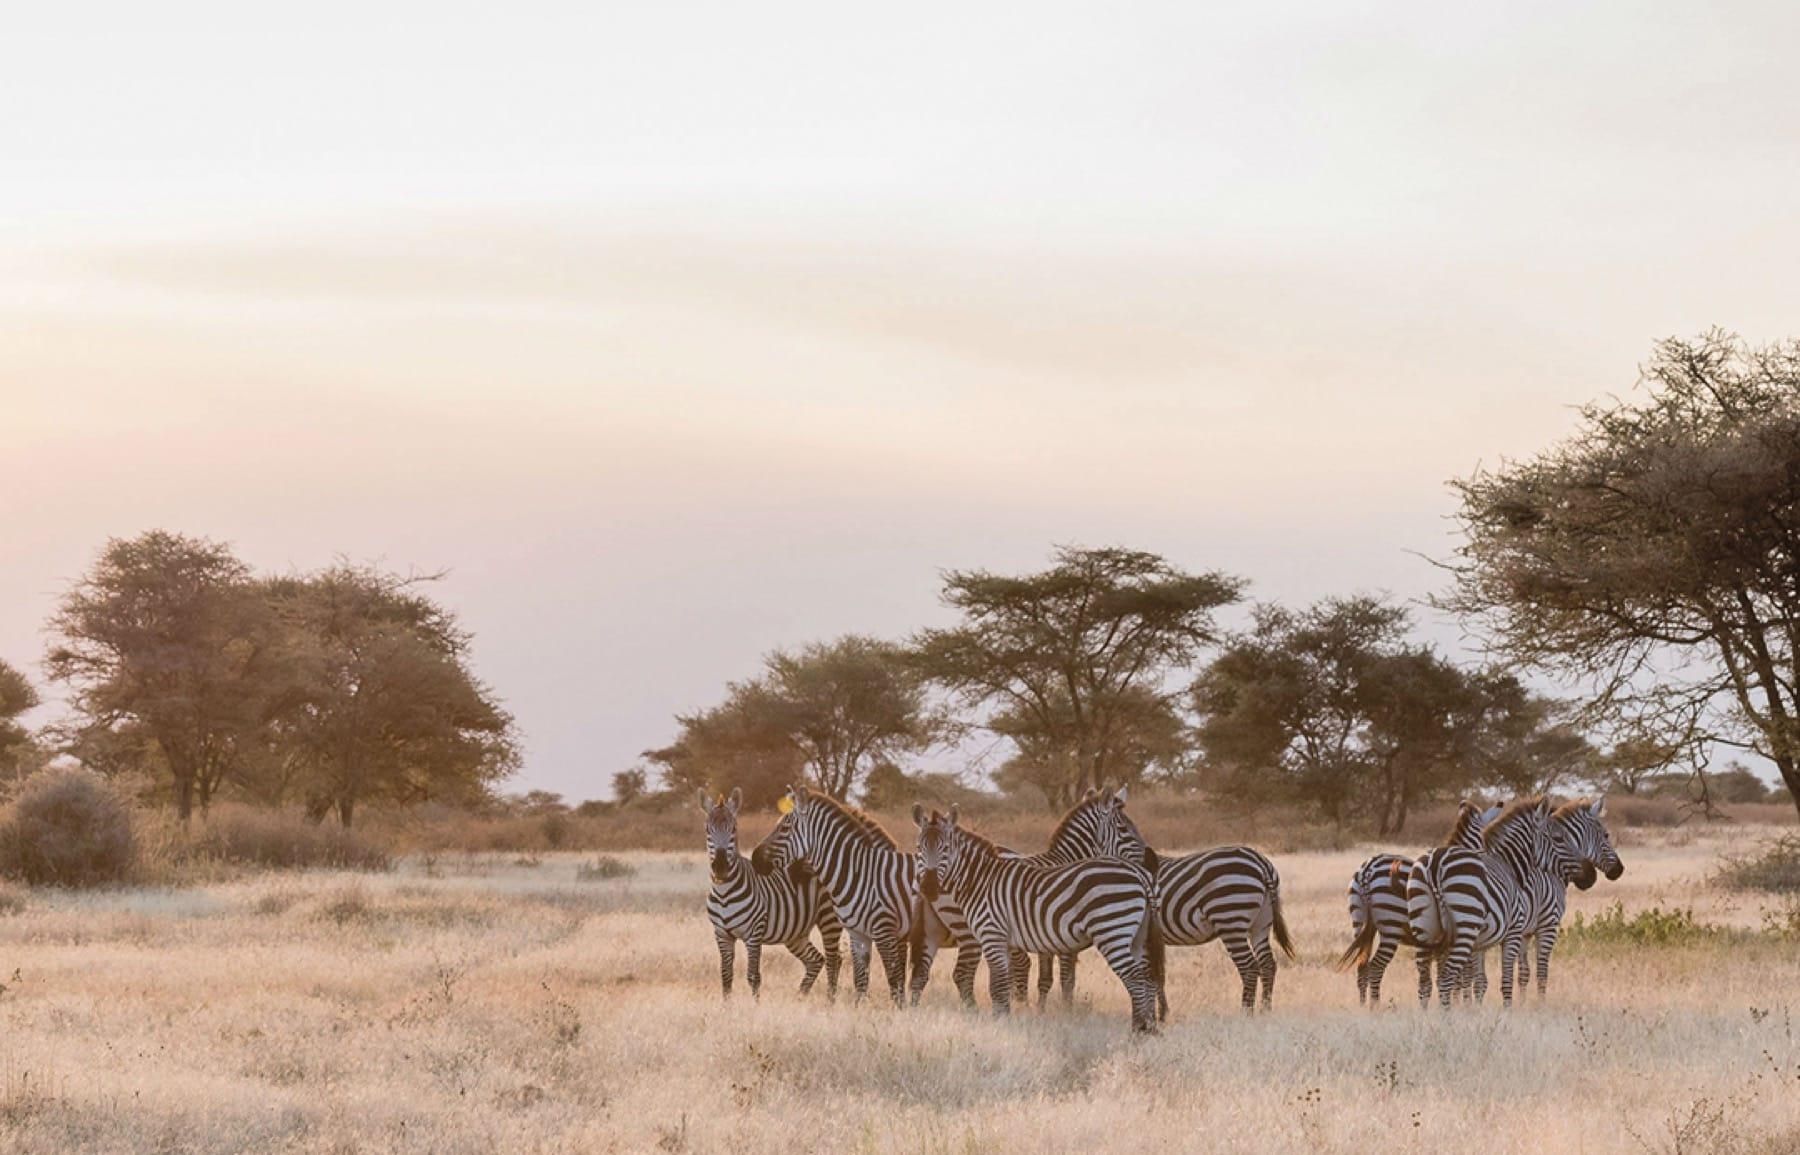 zebra ngorongoro crater wildlife